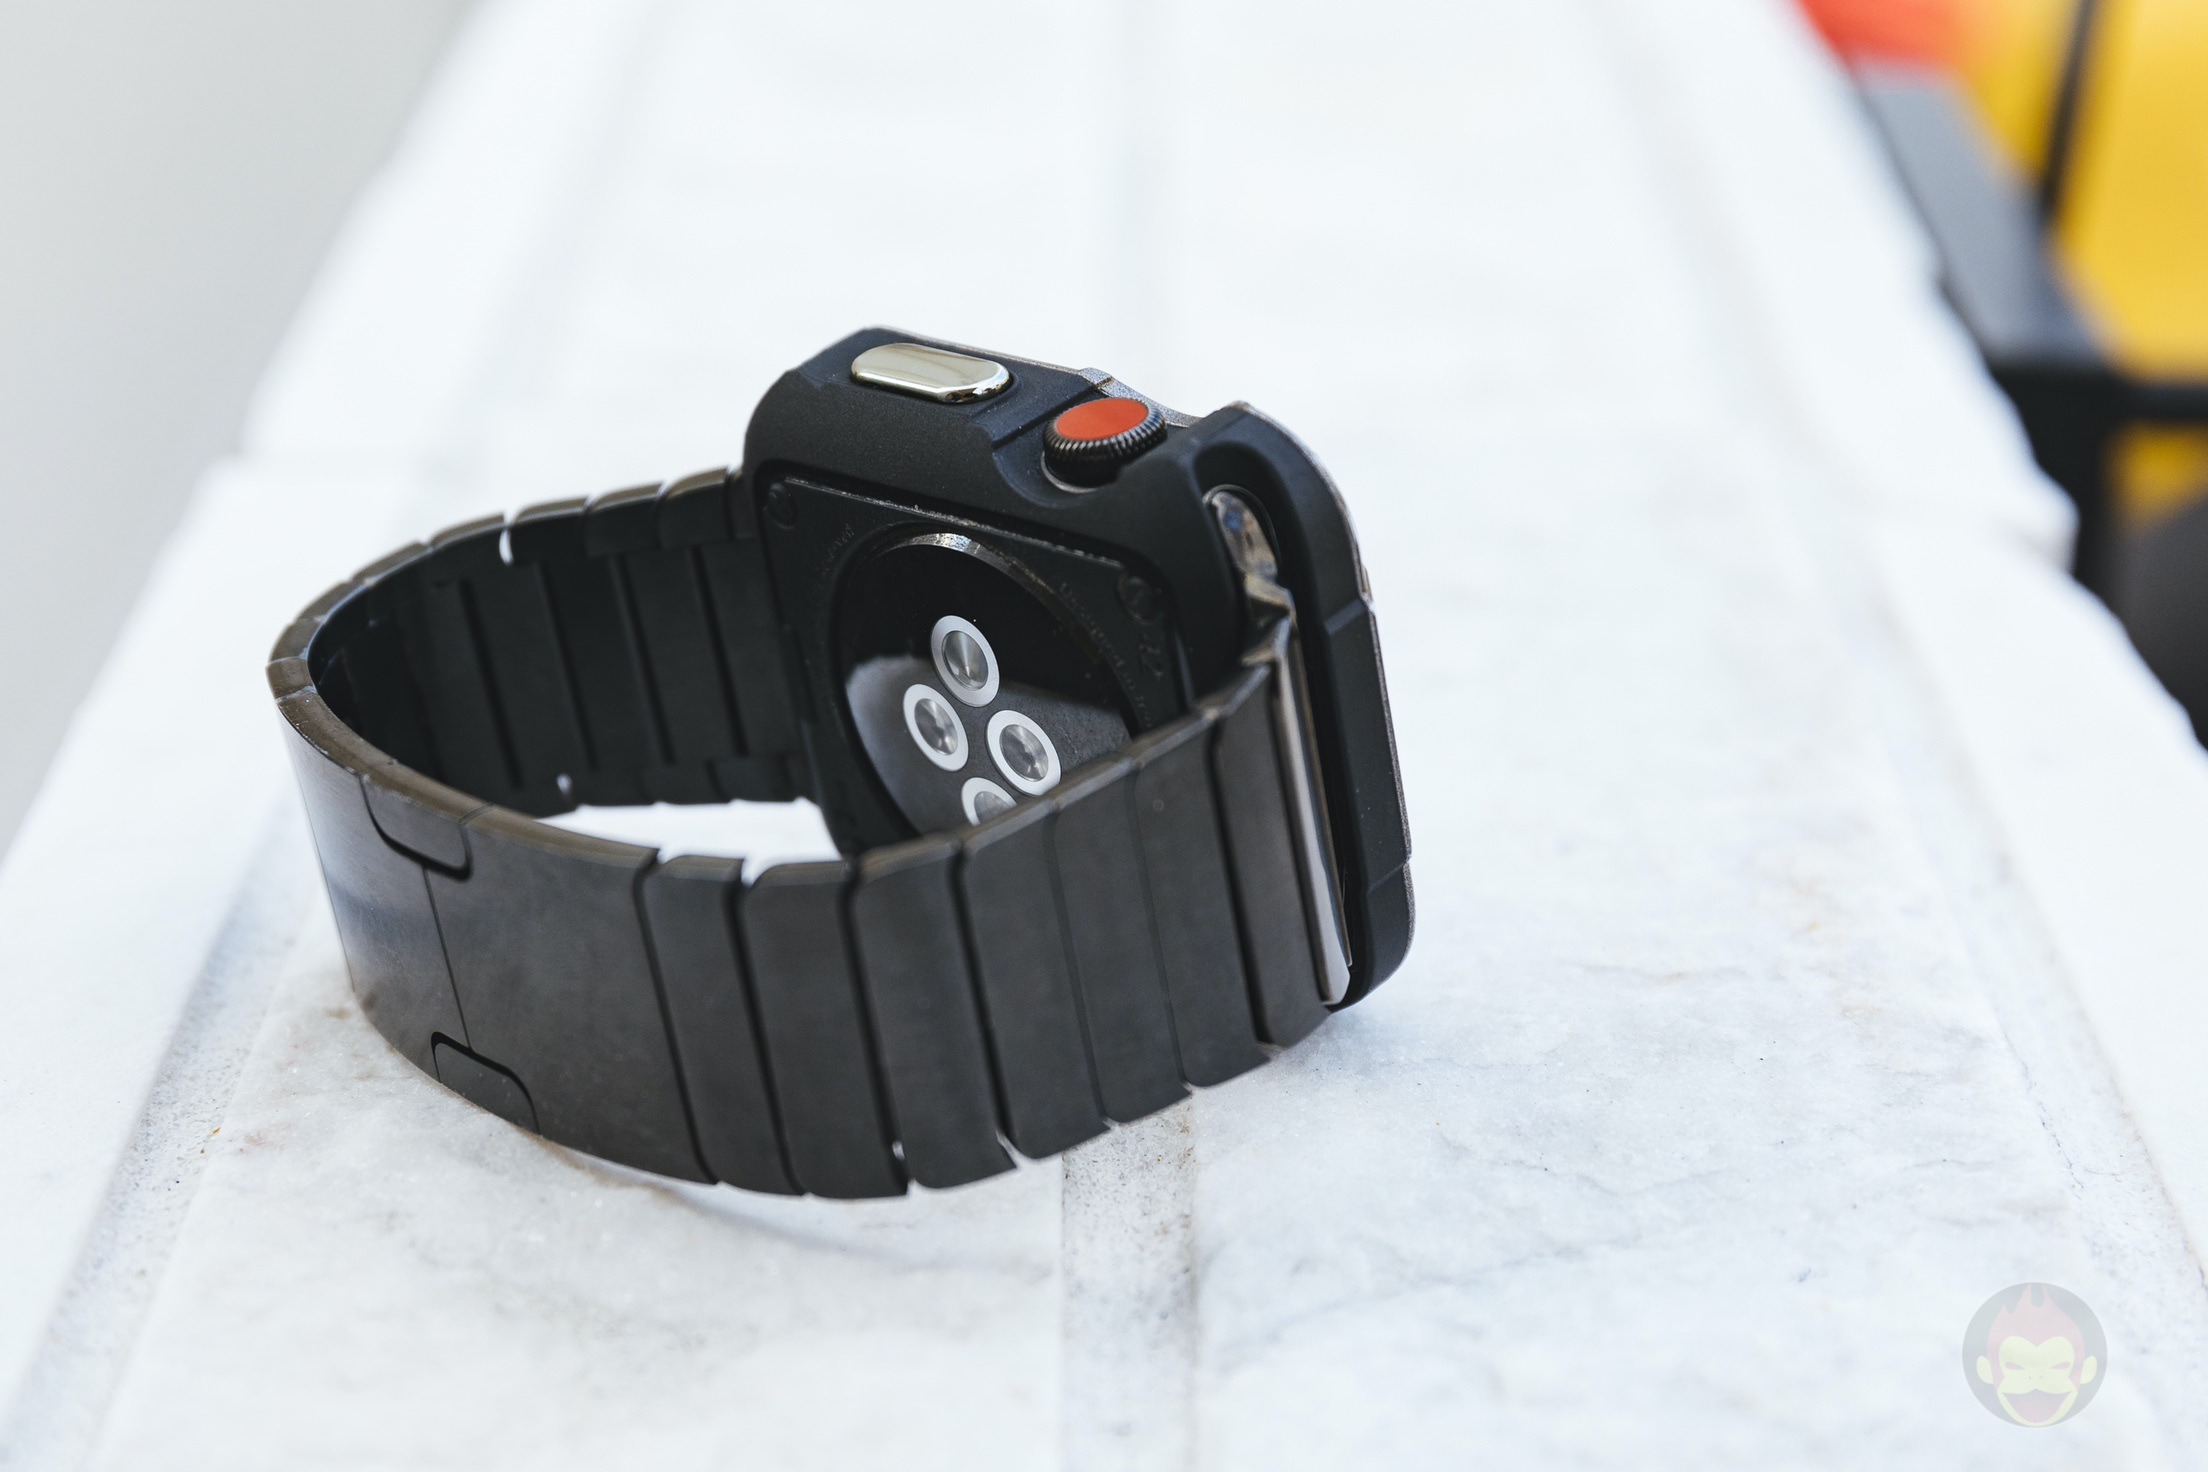 Apple-Watch-Series-3-LTE-Review-07.jpg